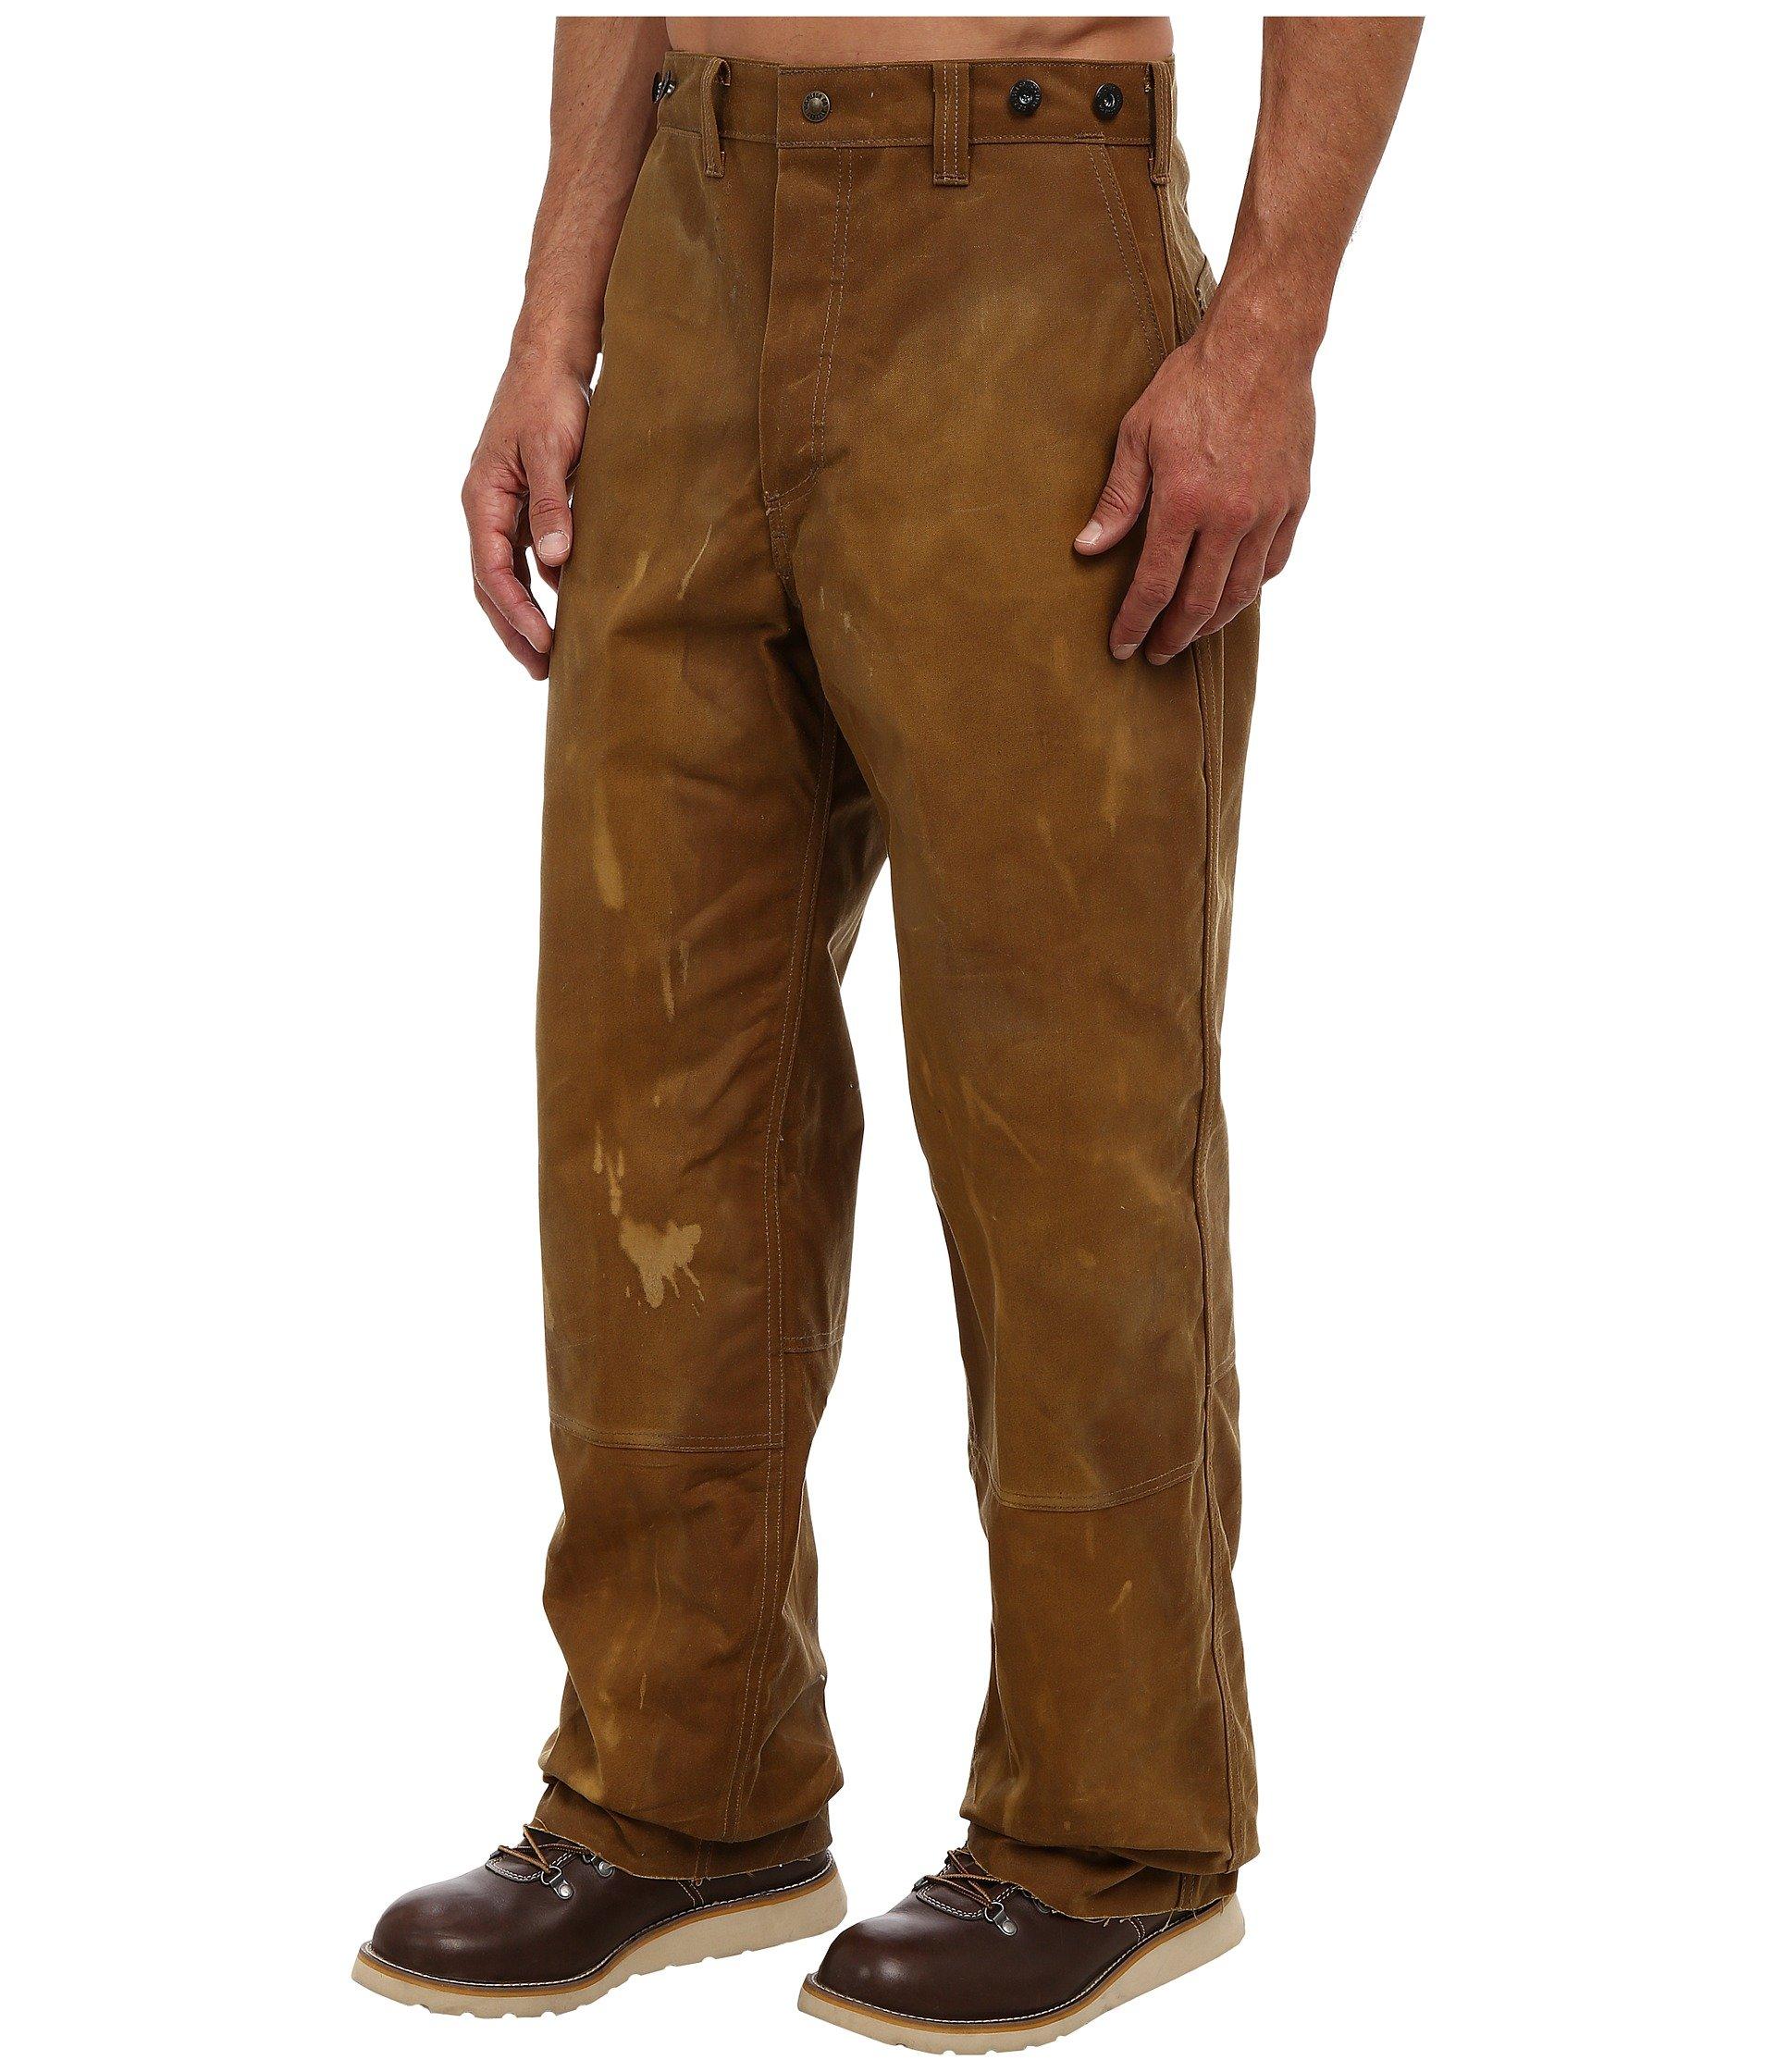 Filson Oil Finish Single Tin Pant - Zappos.com Free ... |Filson Tin Pant Oil Finish